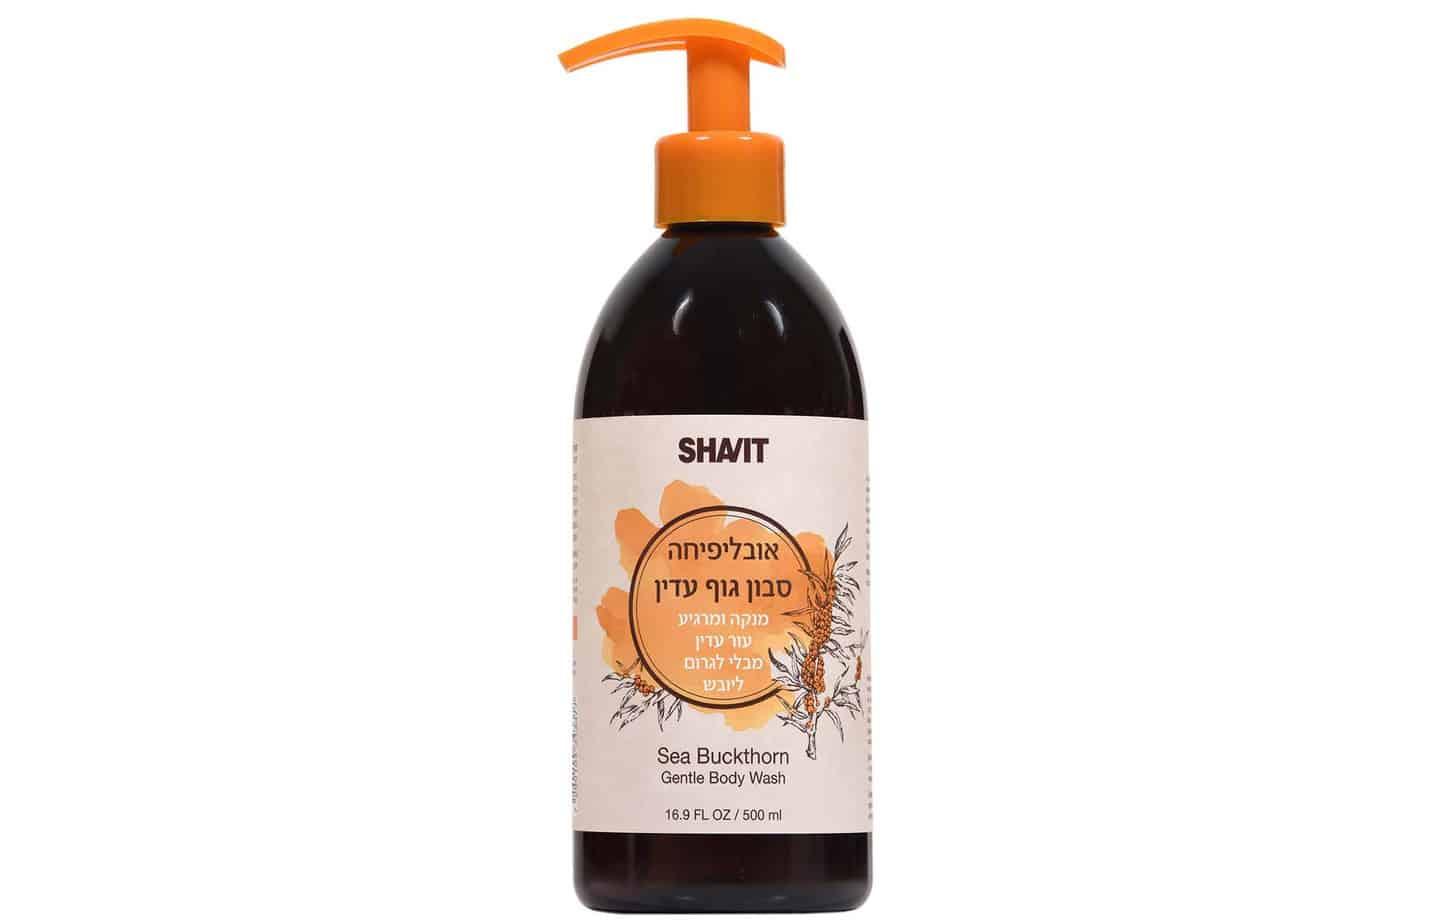 SHAVIT סבון גוף עדין מחיר 49.90 שח ל500 מל צילום אפרת אשל